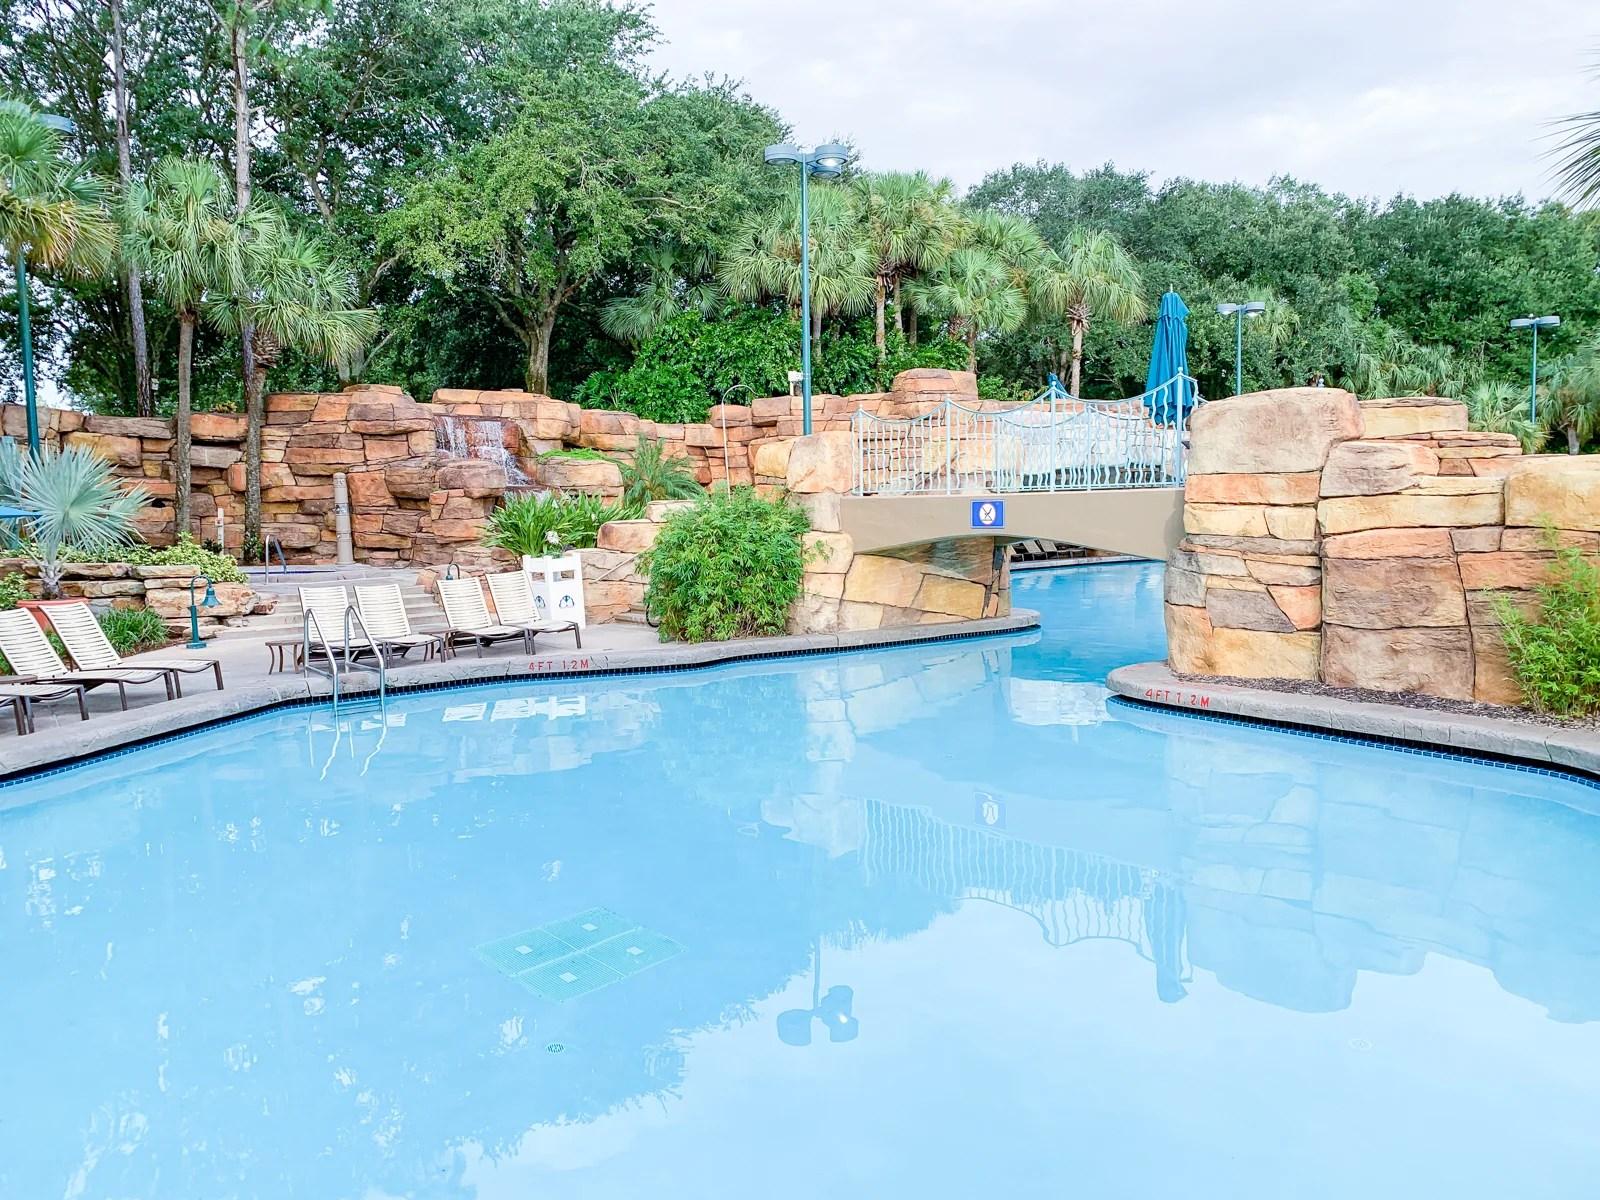 Comparing Marriott's Swan and Dolphin Walt Disney World Resorts